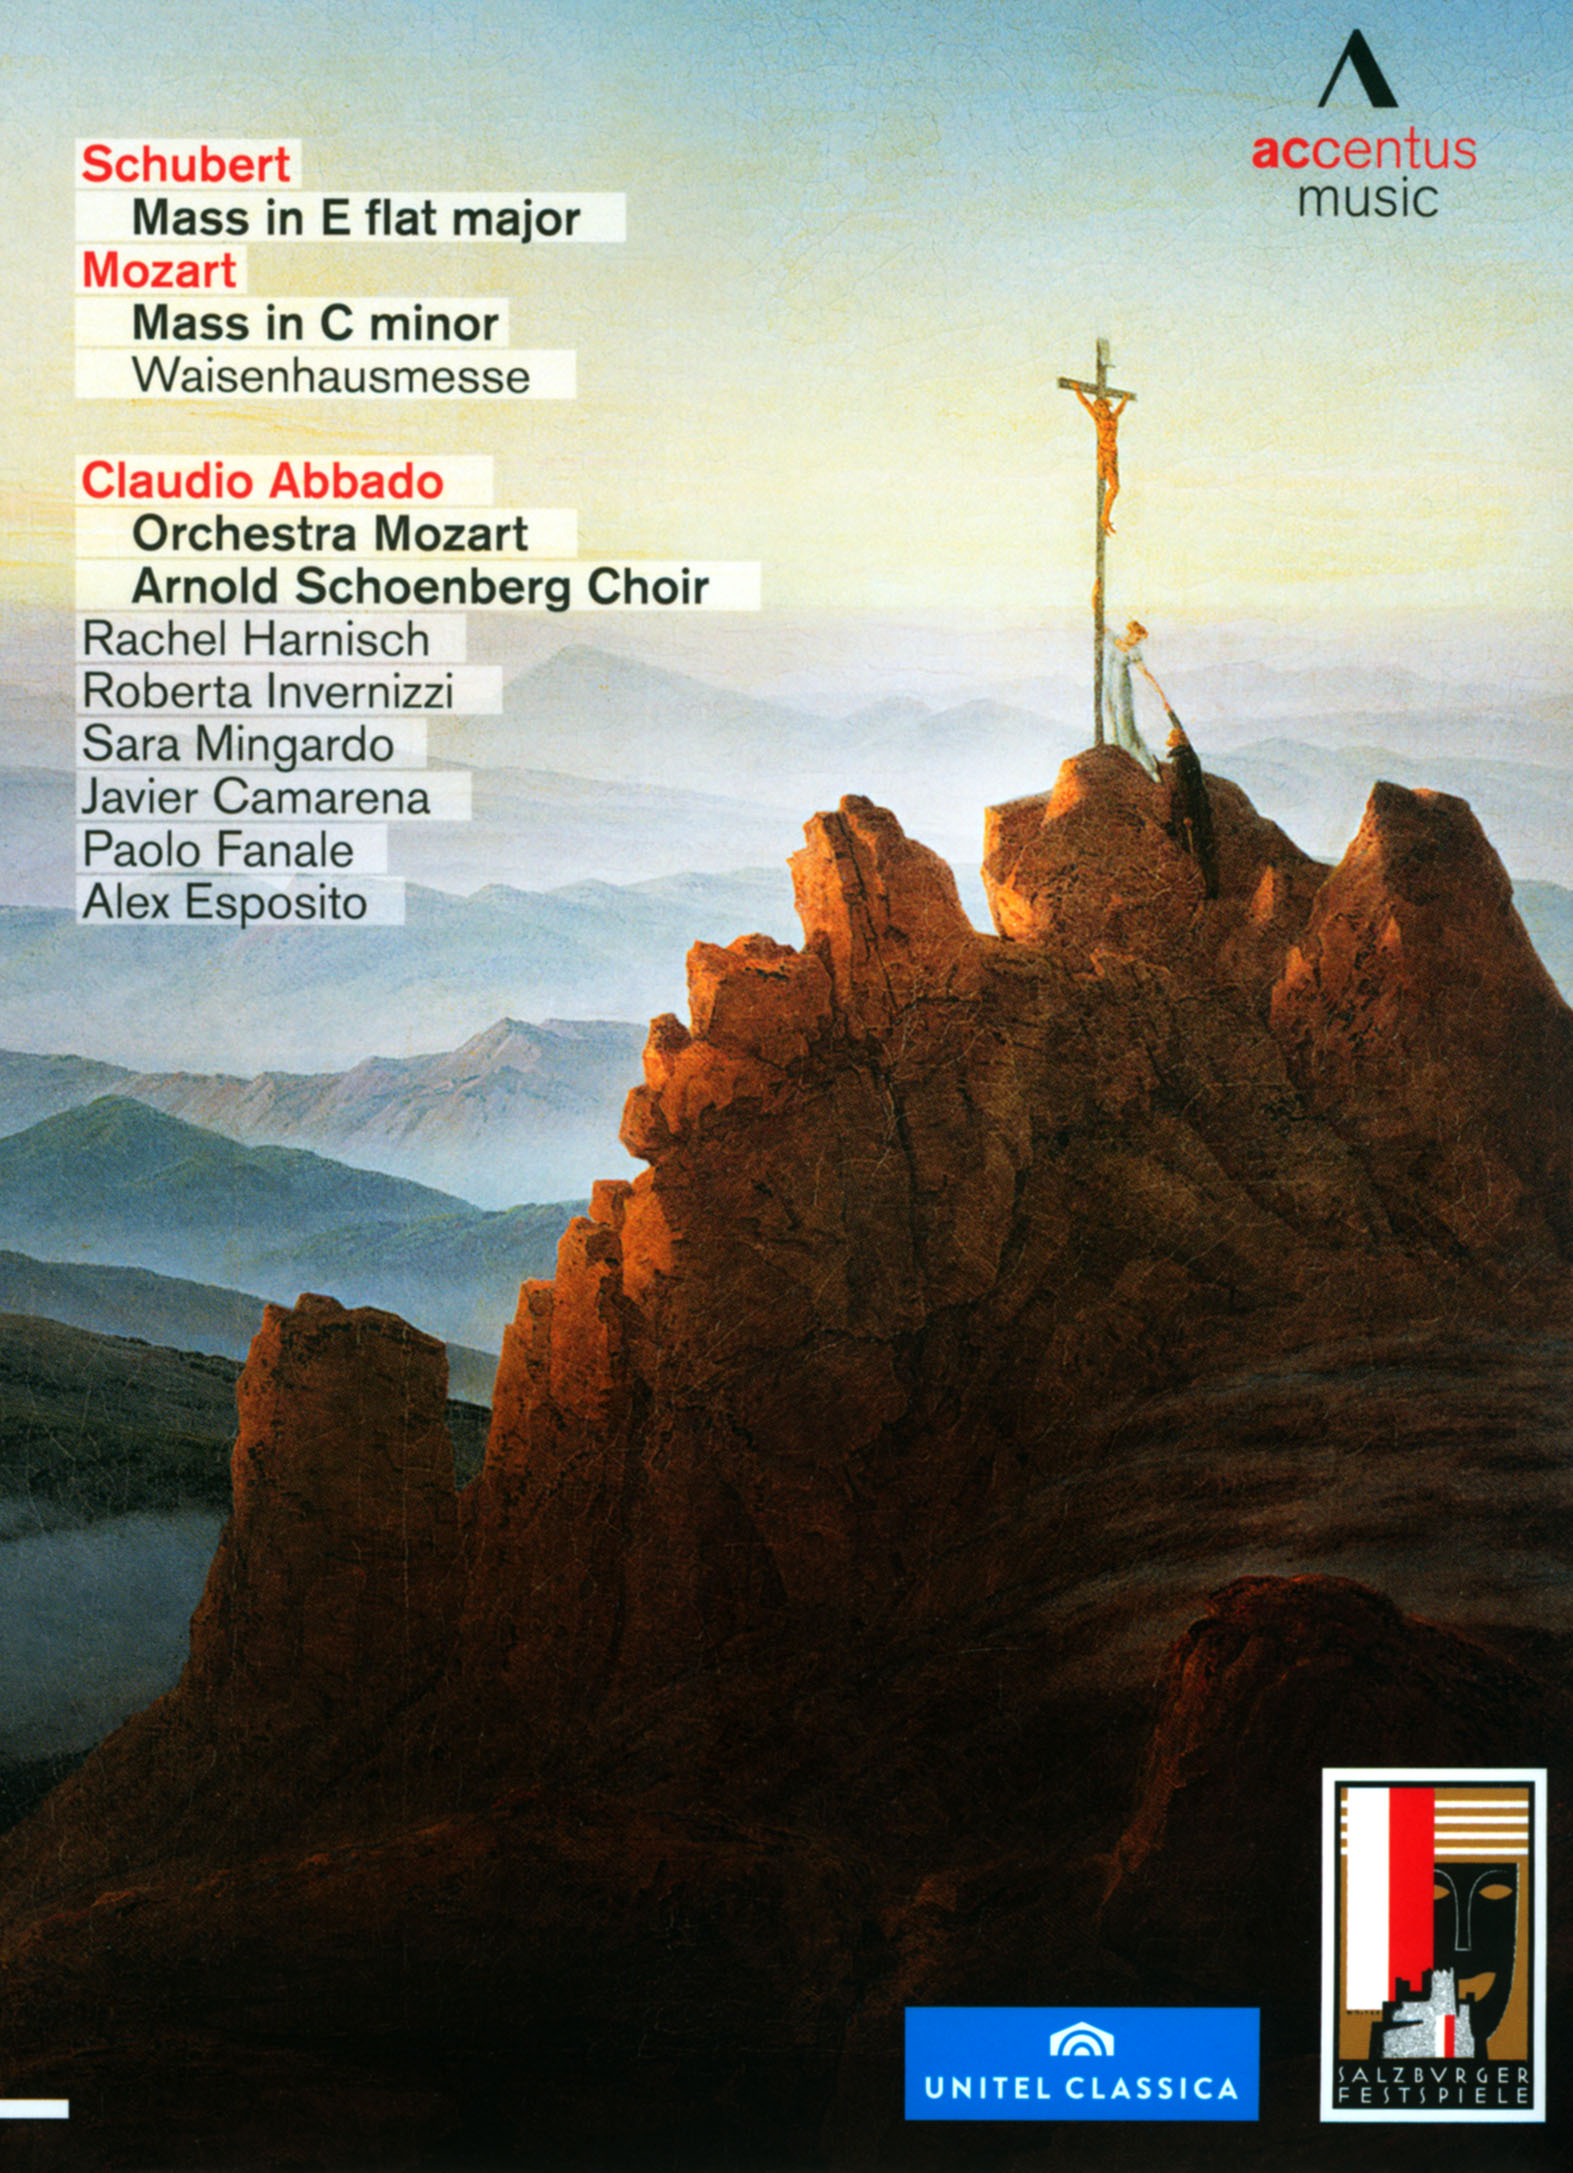 Claudio Abbado/Orchestra Mozart: Schubert - Mass in E Flat Major/Mozart - Mass in C Minor